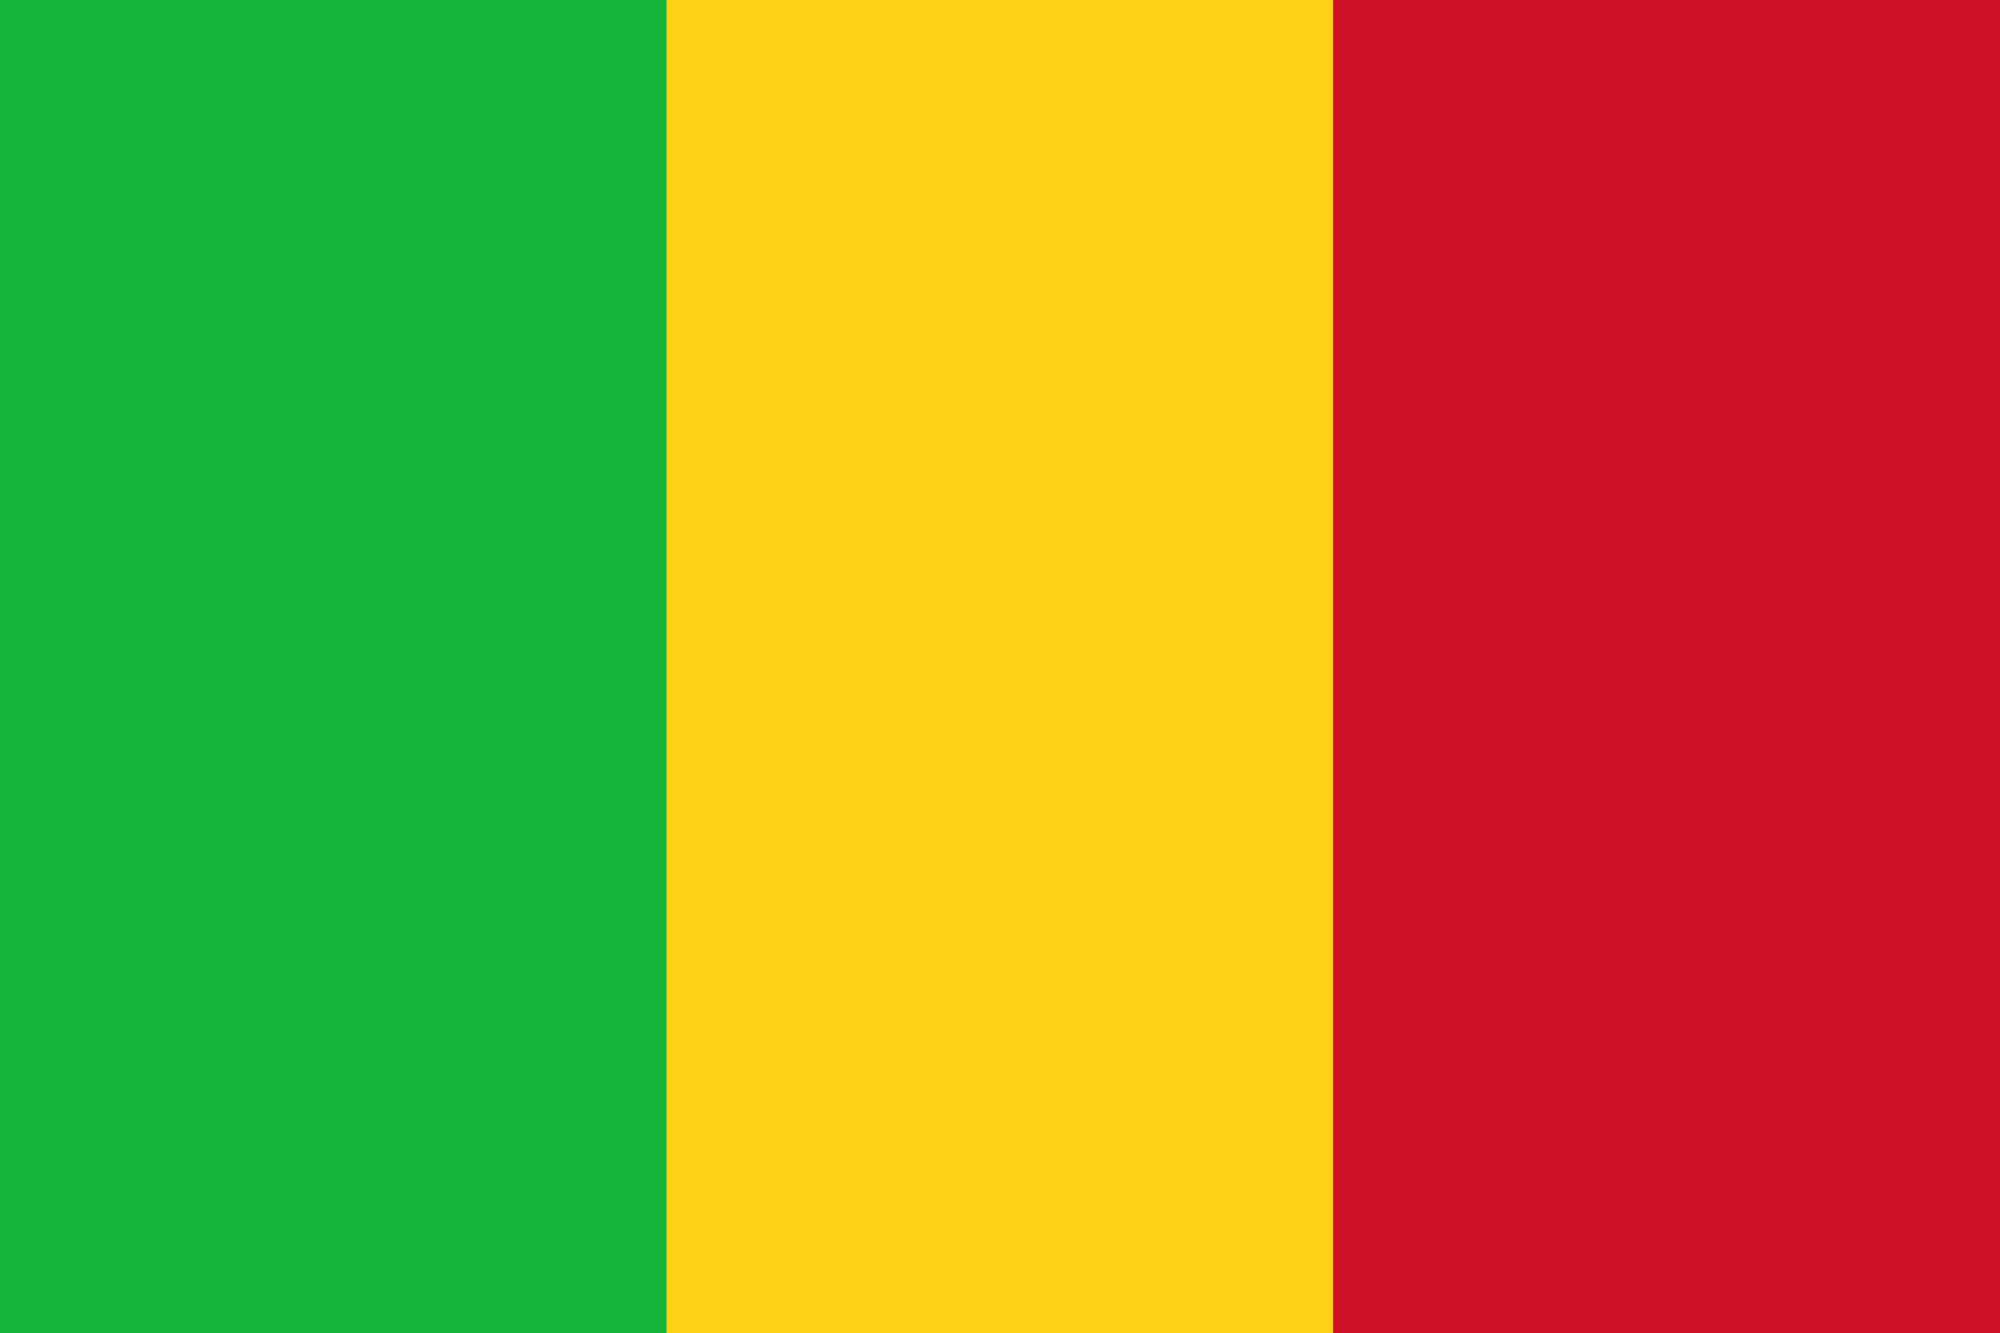 Flag of Mali, Africa